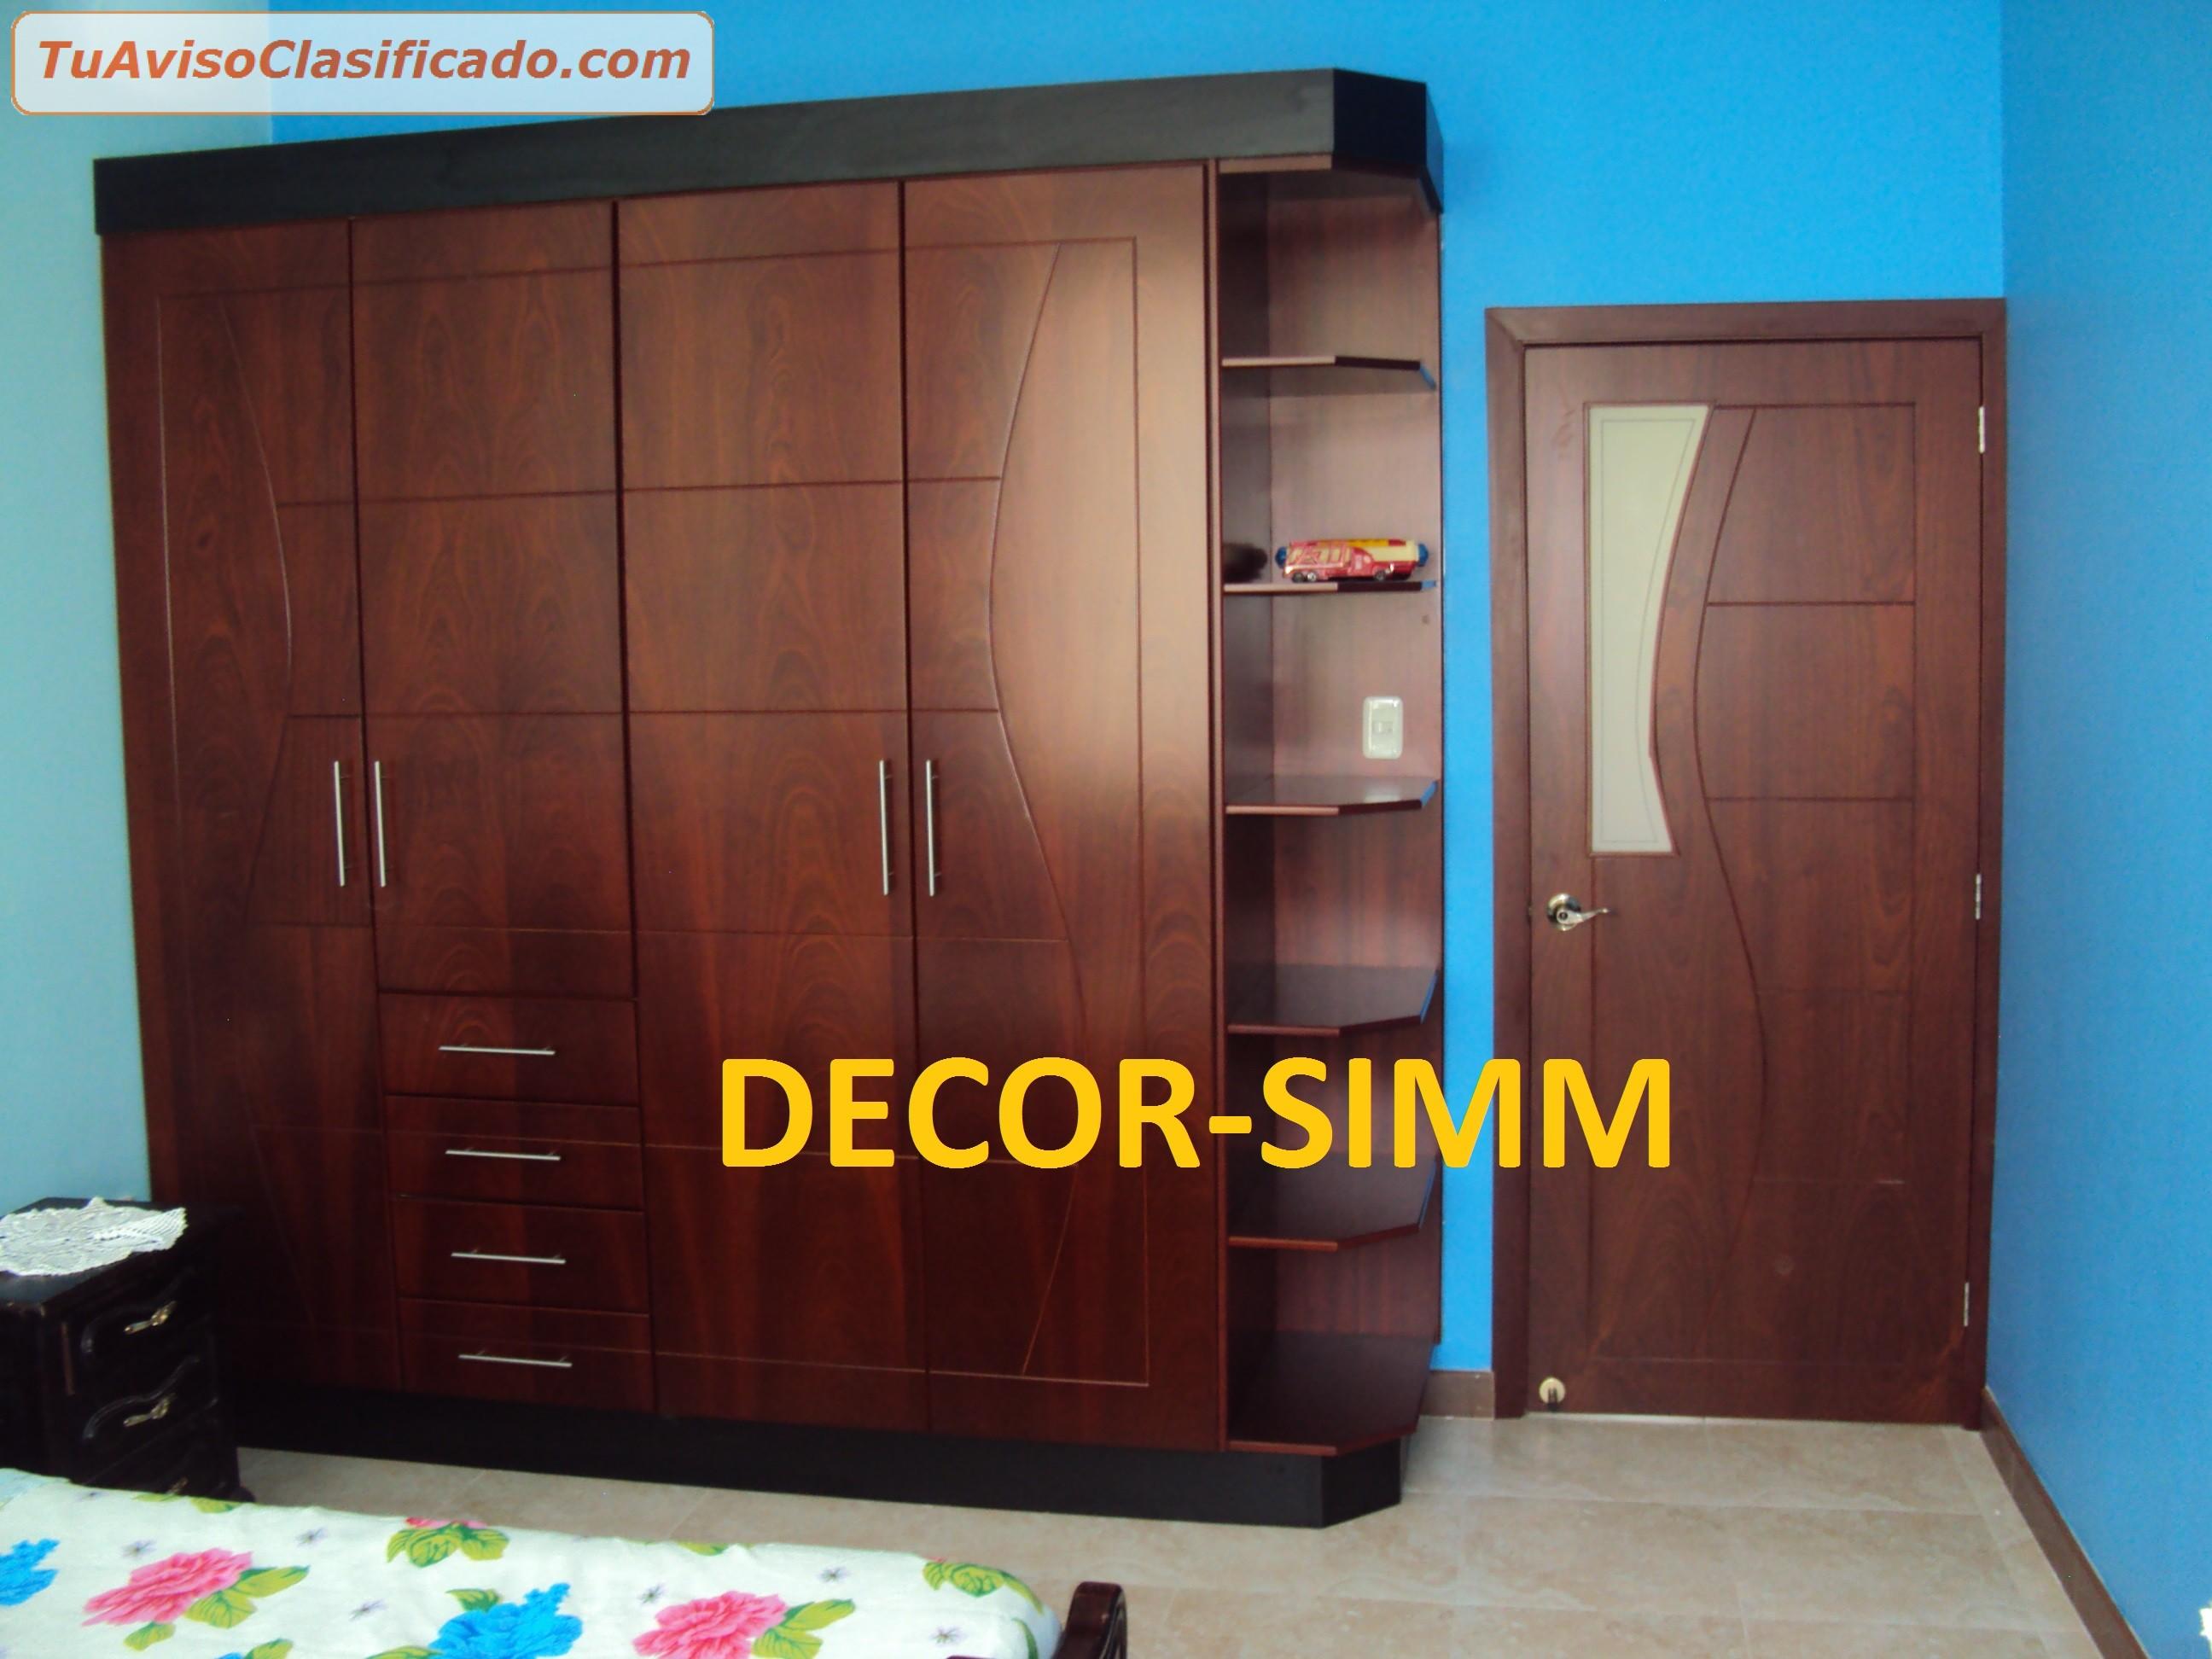 muebles de cocina modernos quito de cocina modernos precio a convenir hogar y muebles cocina